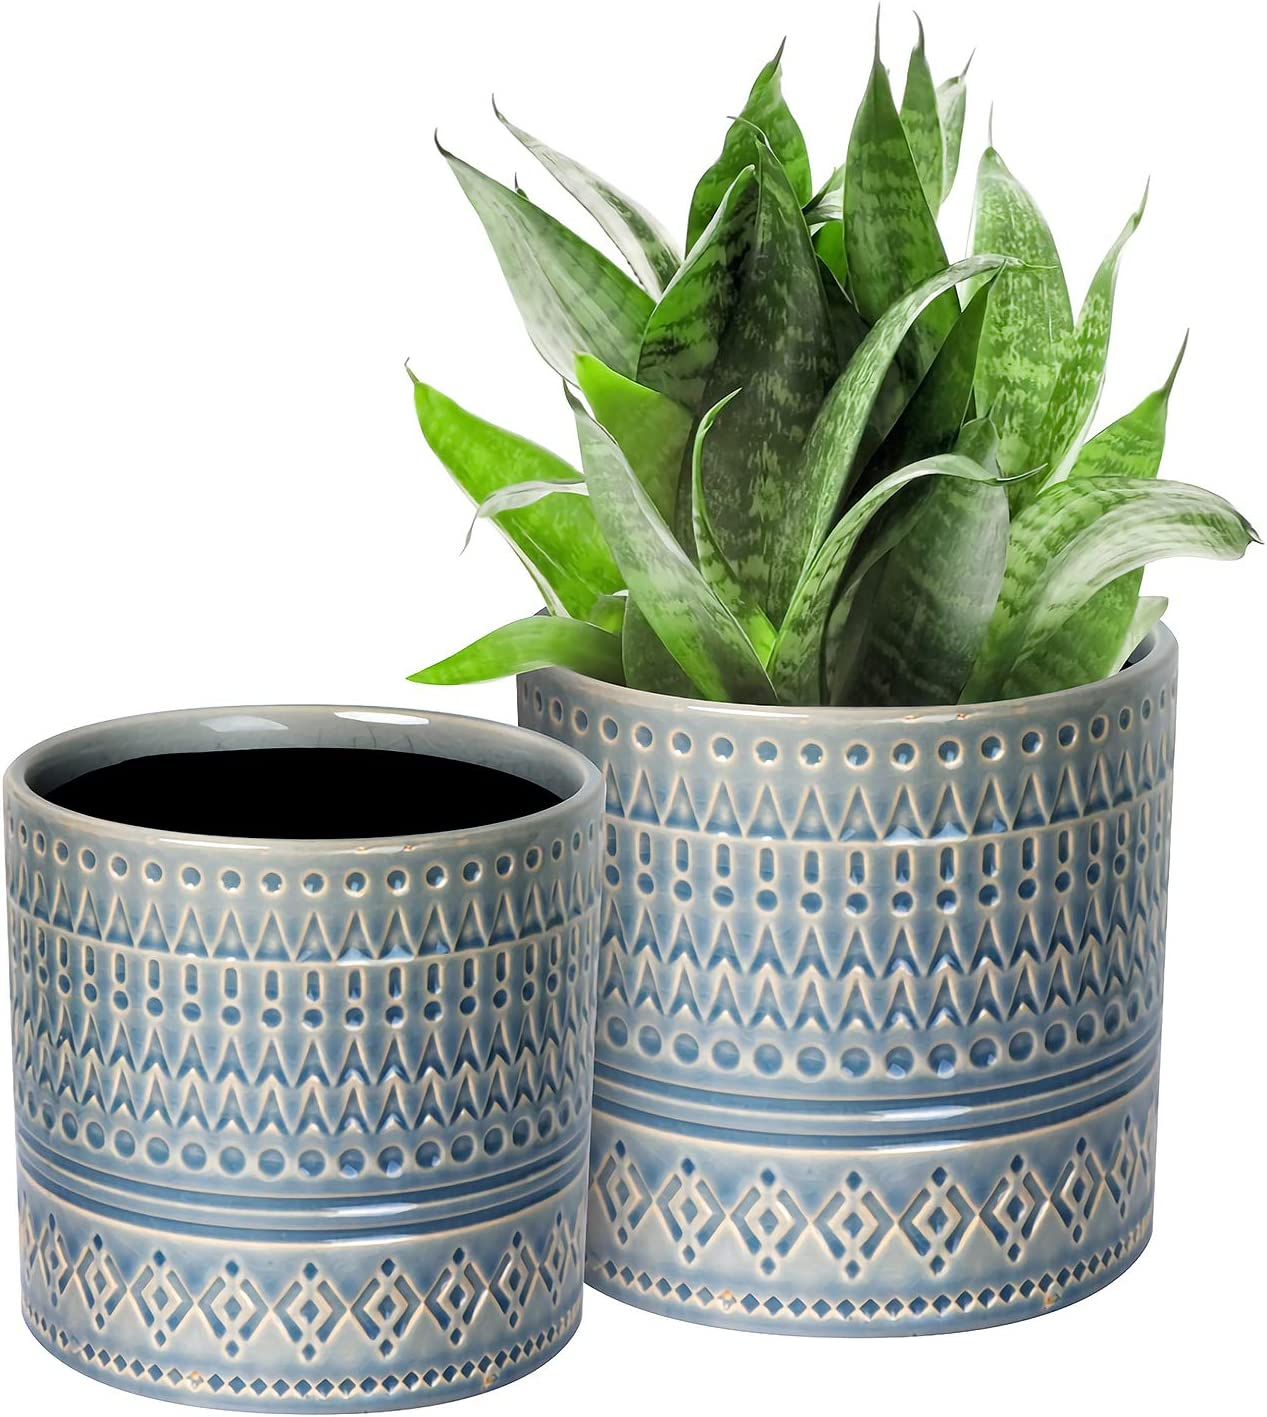 Voeveca Ceramic Flower Pot Garden Planters 6.9